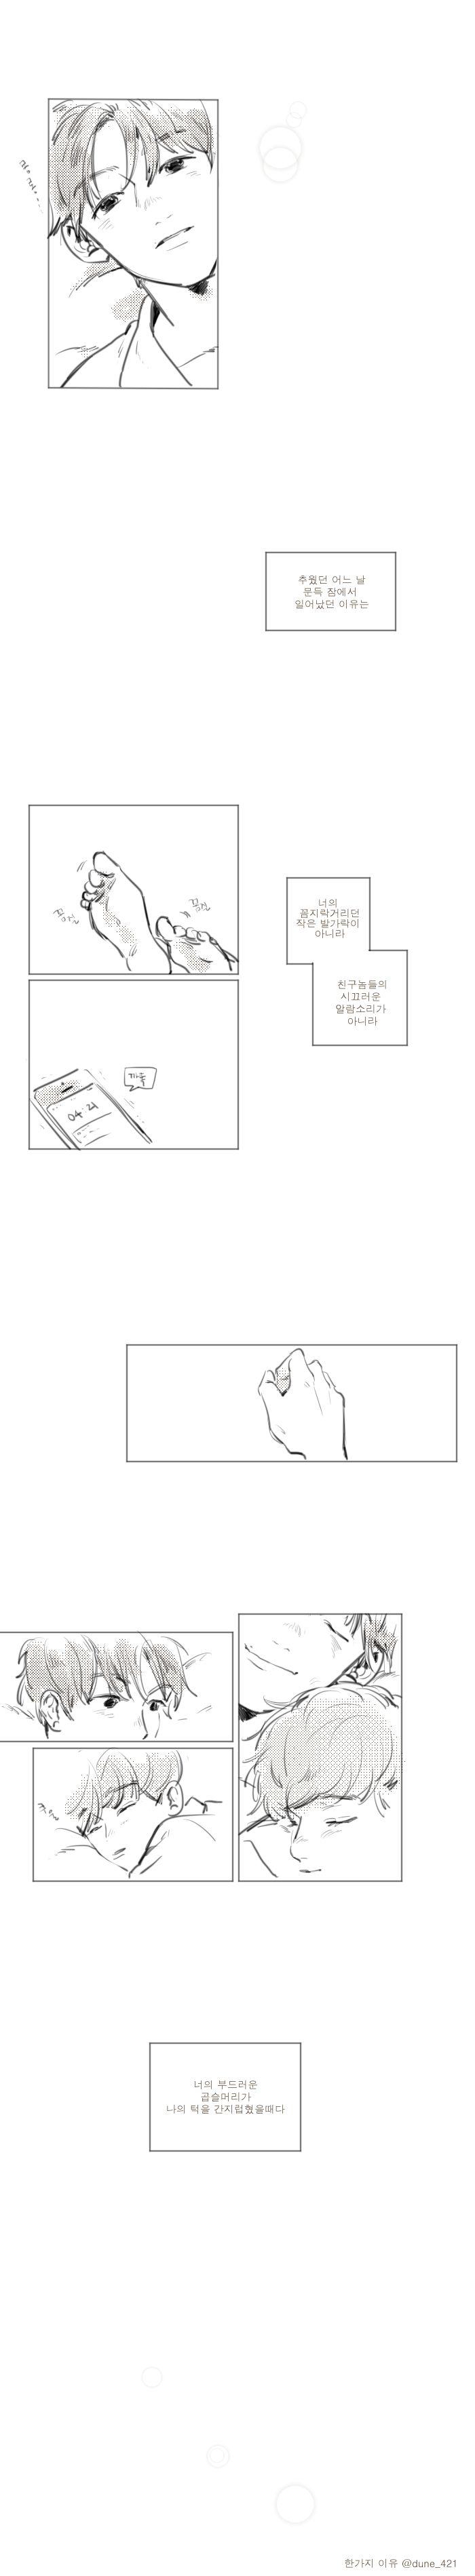 Baekchen webzine - una de las razones - oi · · ♥ '· w · `